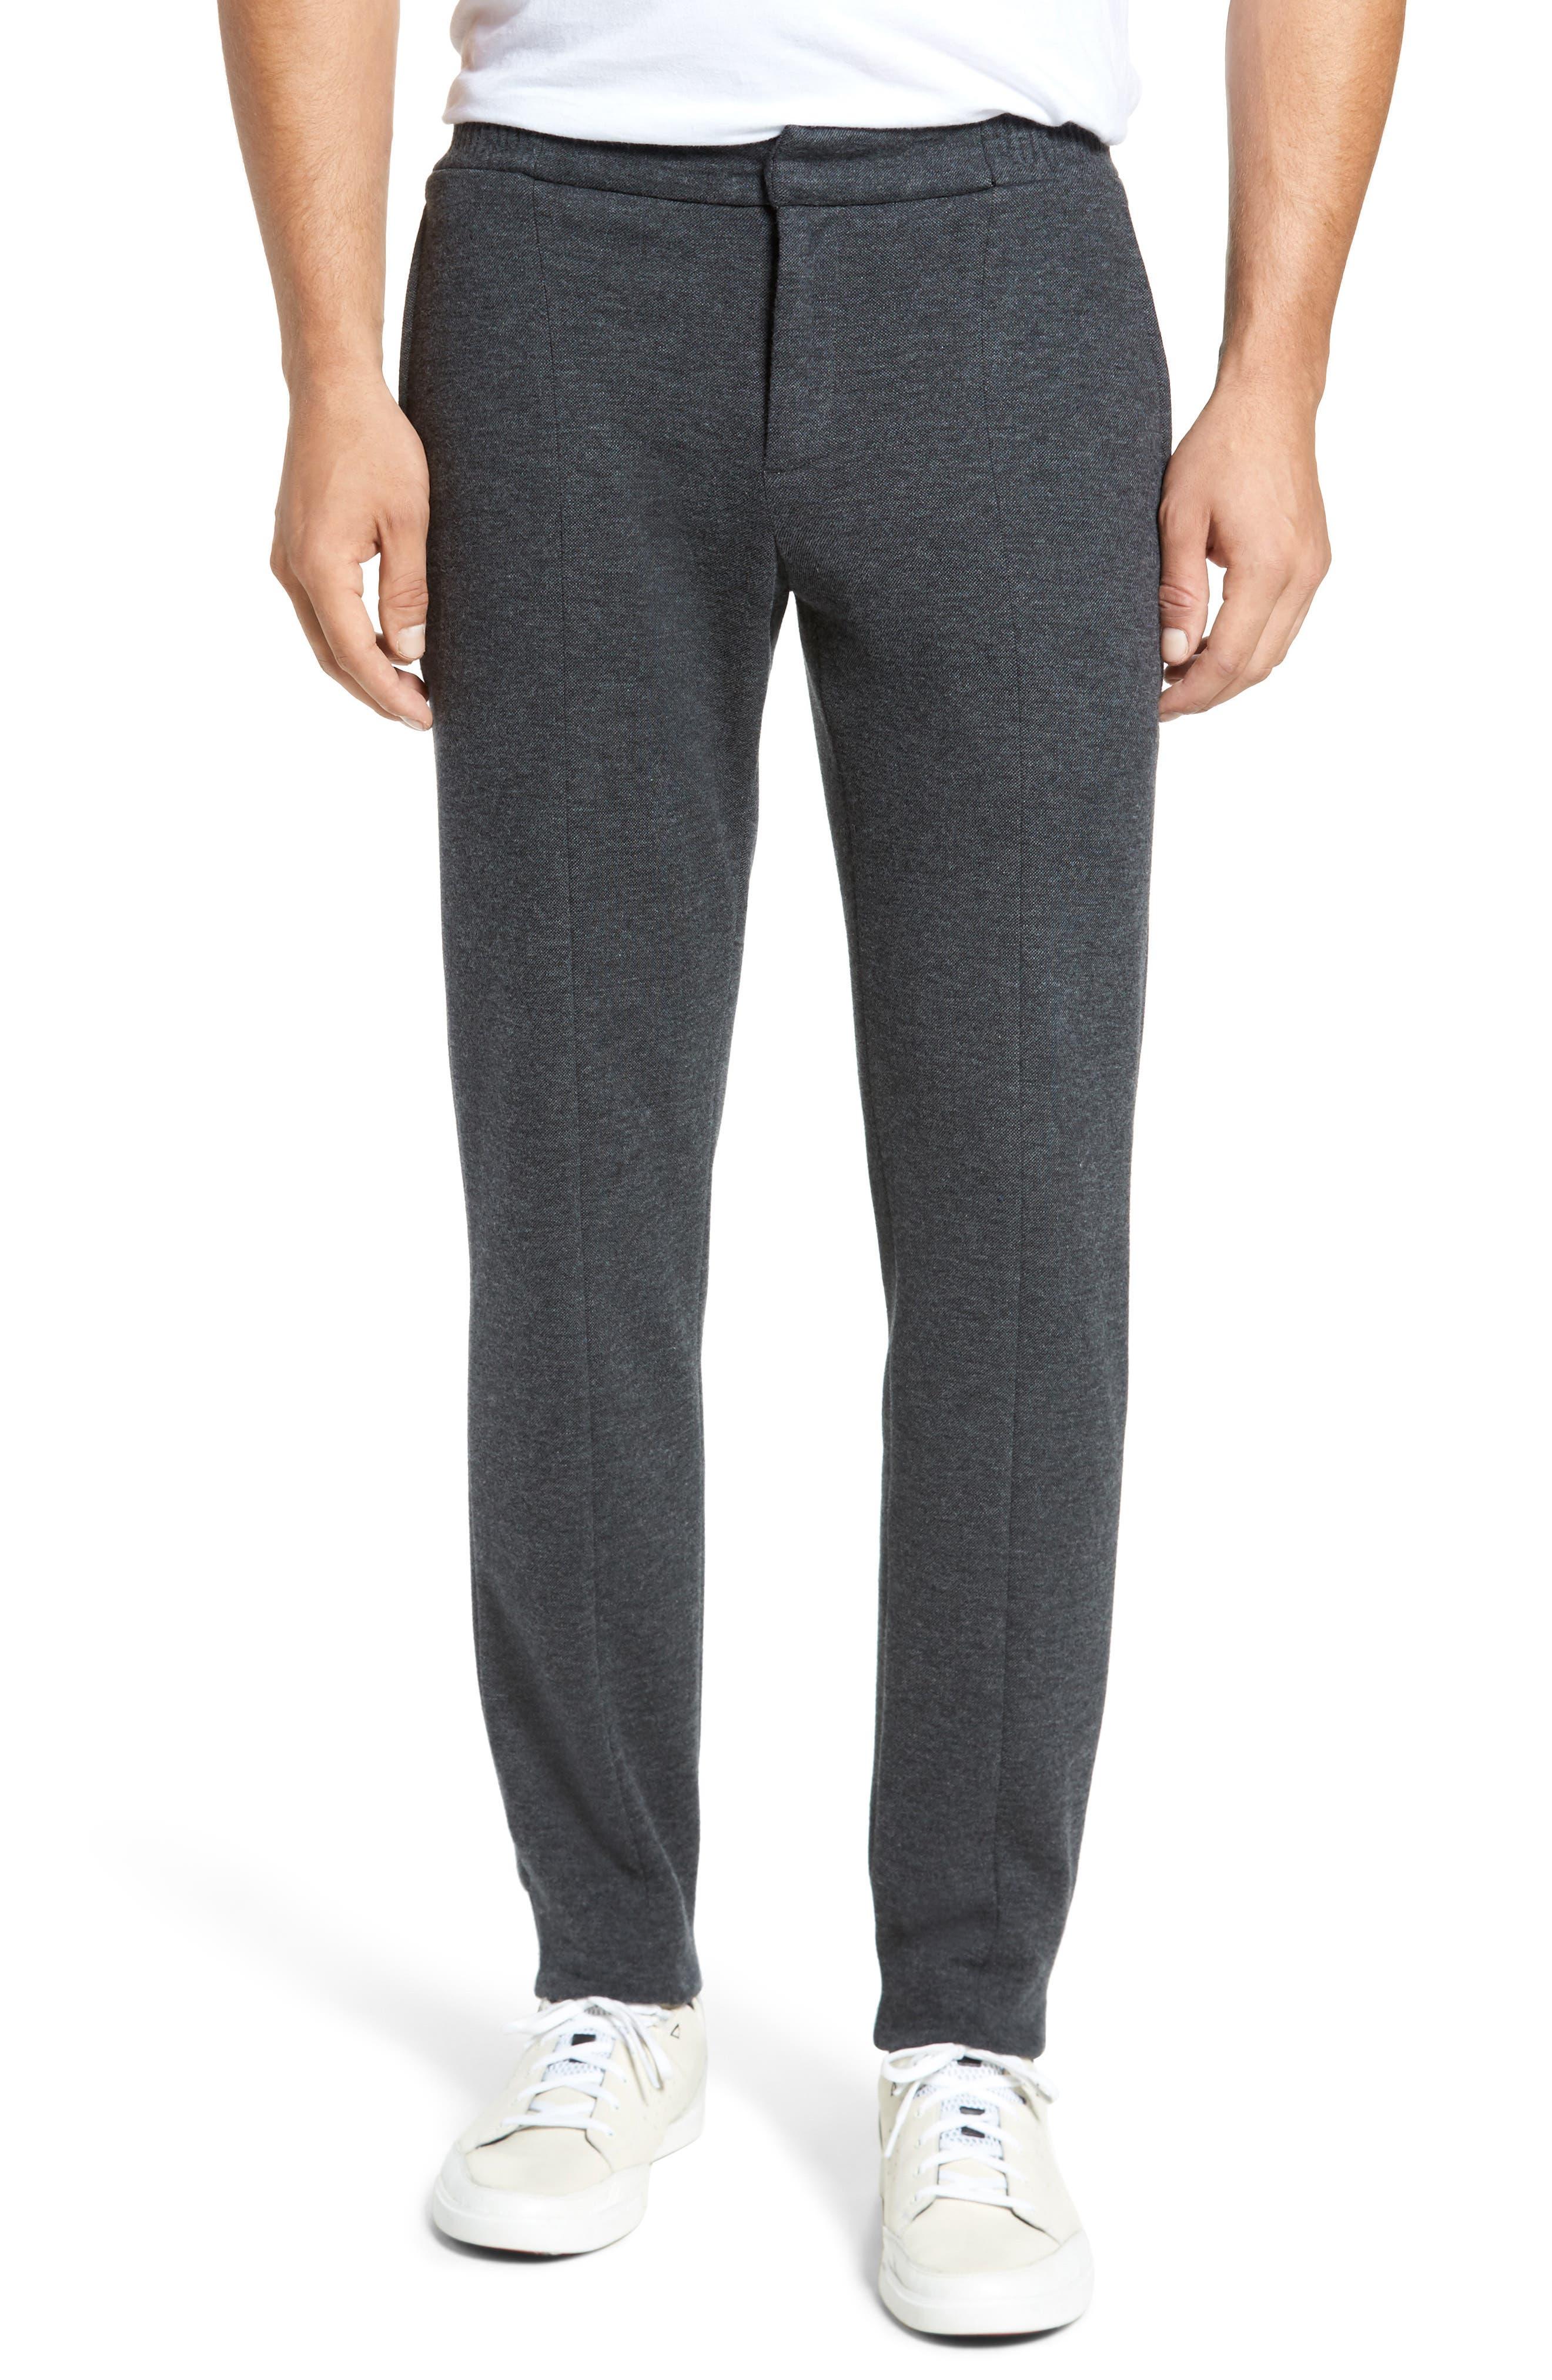 Zanella Jordan Flat Front Cotton Jogger Trousers